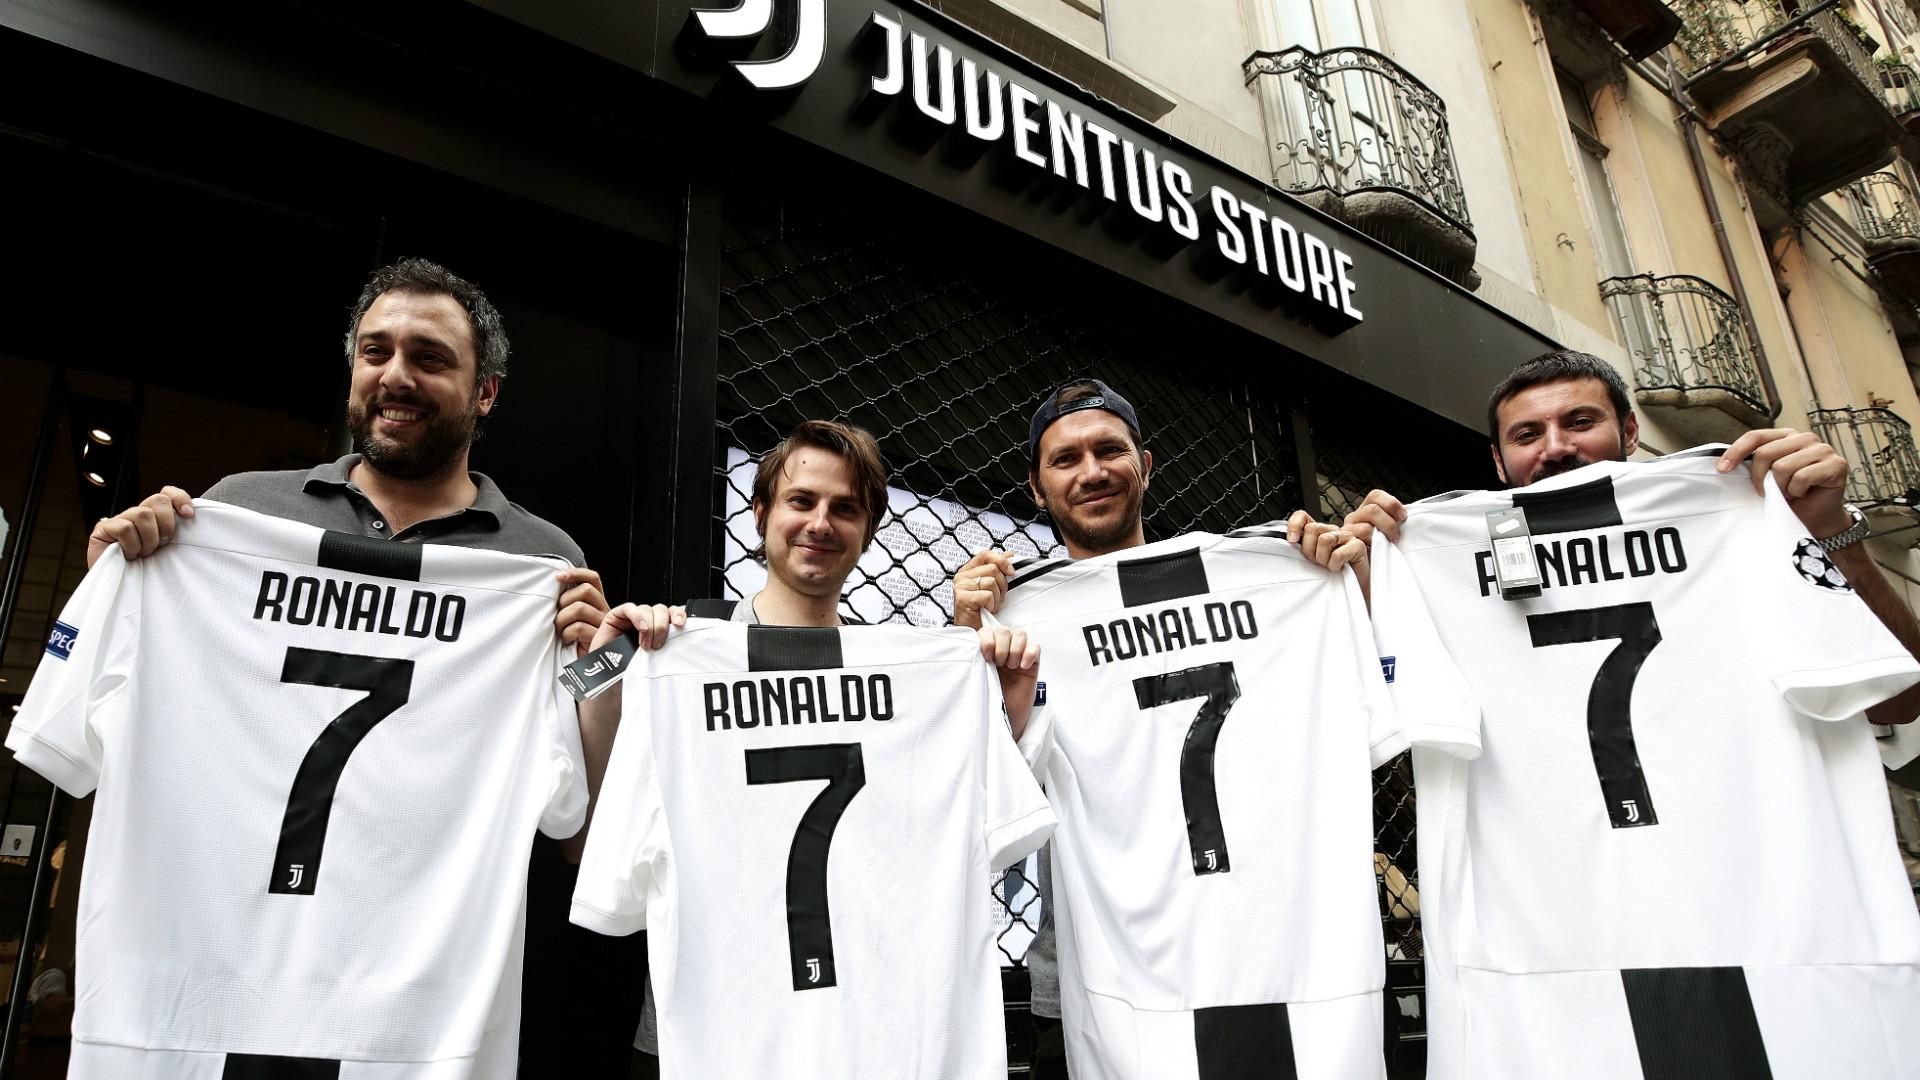 premium selection 438dc 2eca9 Juventus fans gave Cristiano Ronaldo a rousing welcome 1 ...